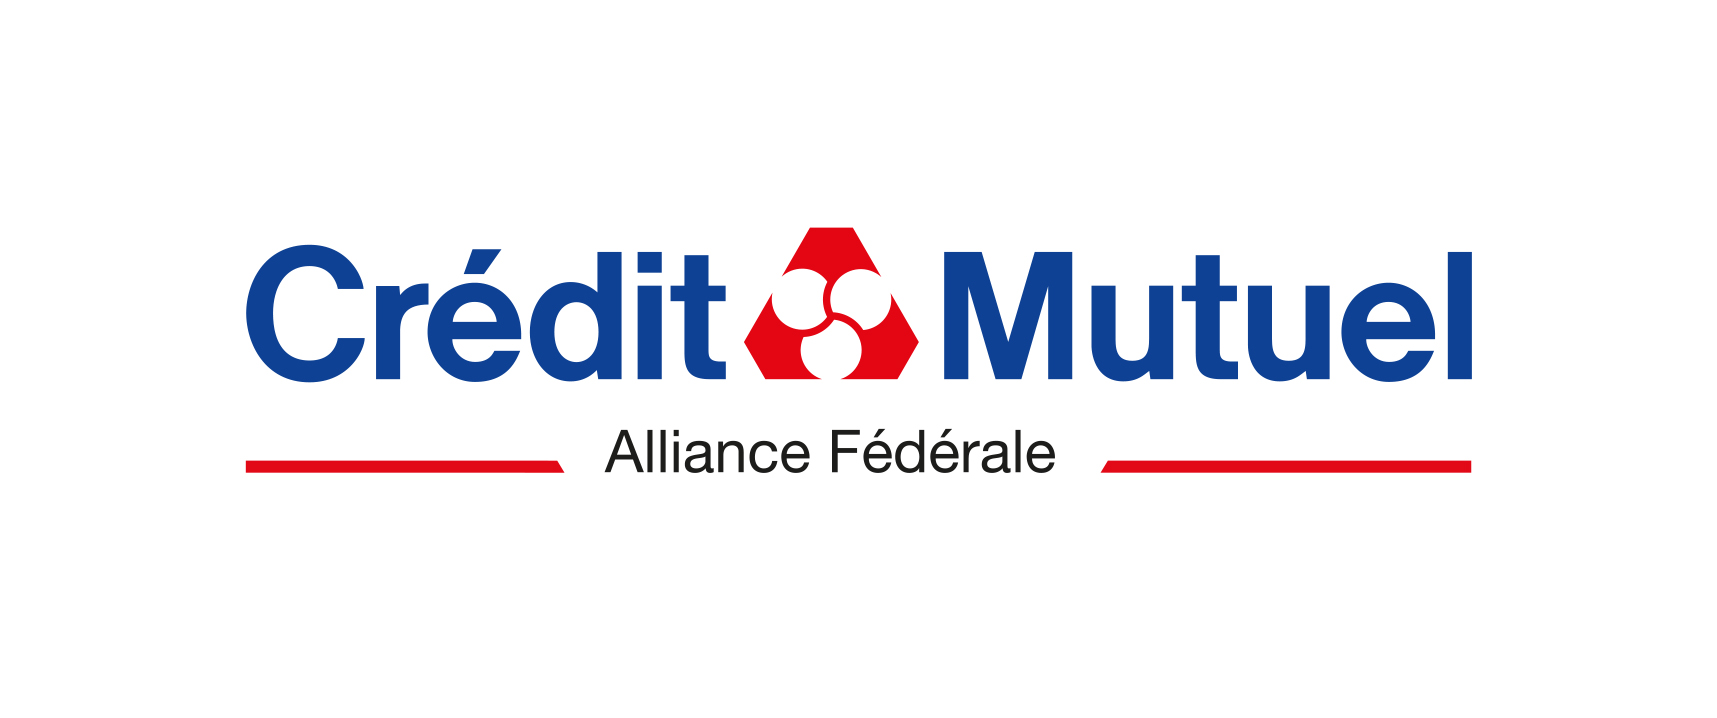 File:Credit-mutuel-alliance-federale-logo.jpg - Wikimedia Commons